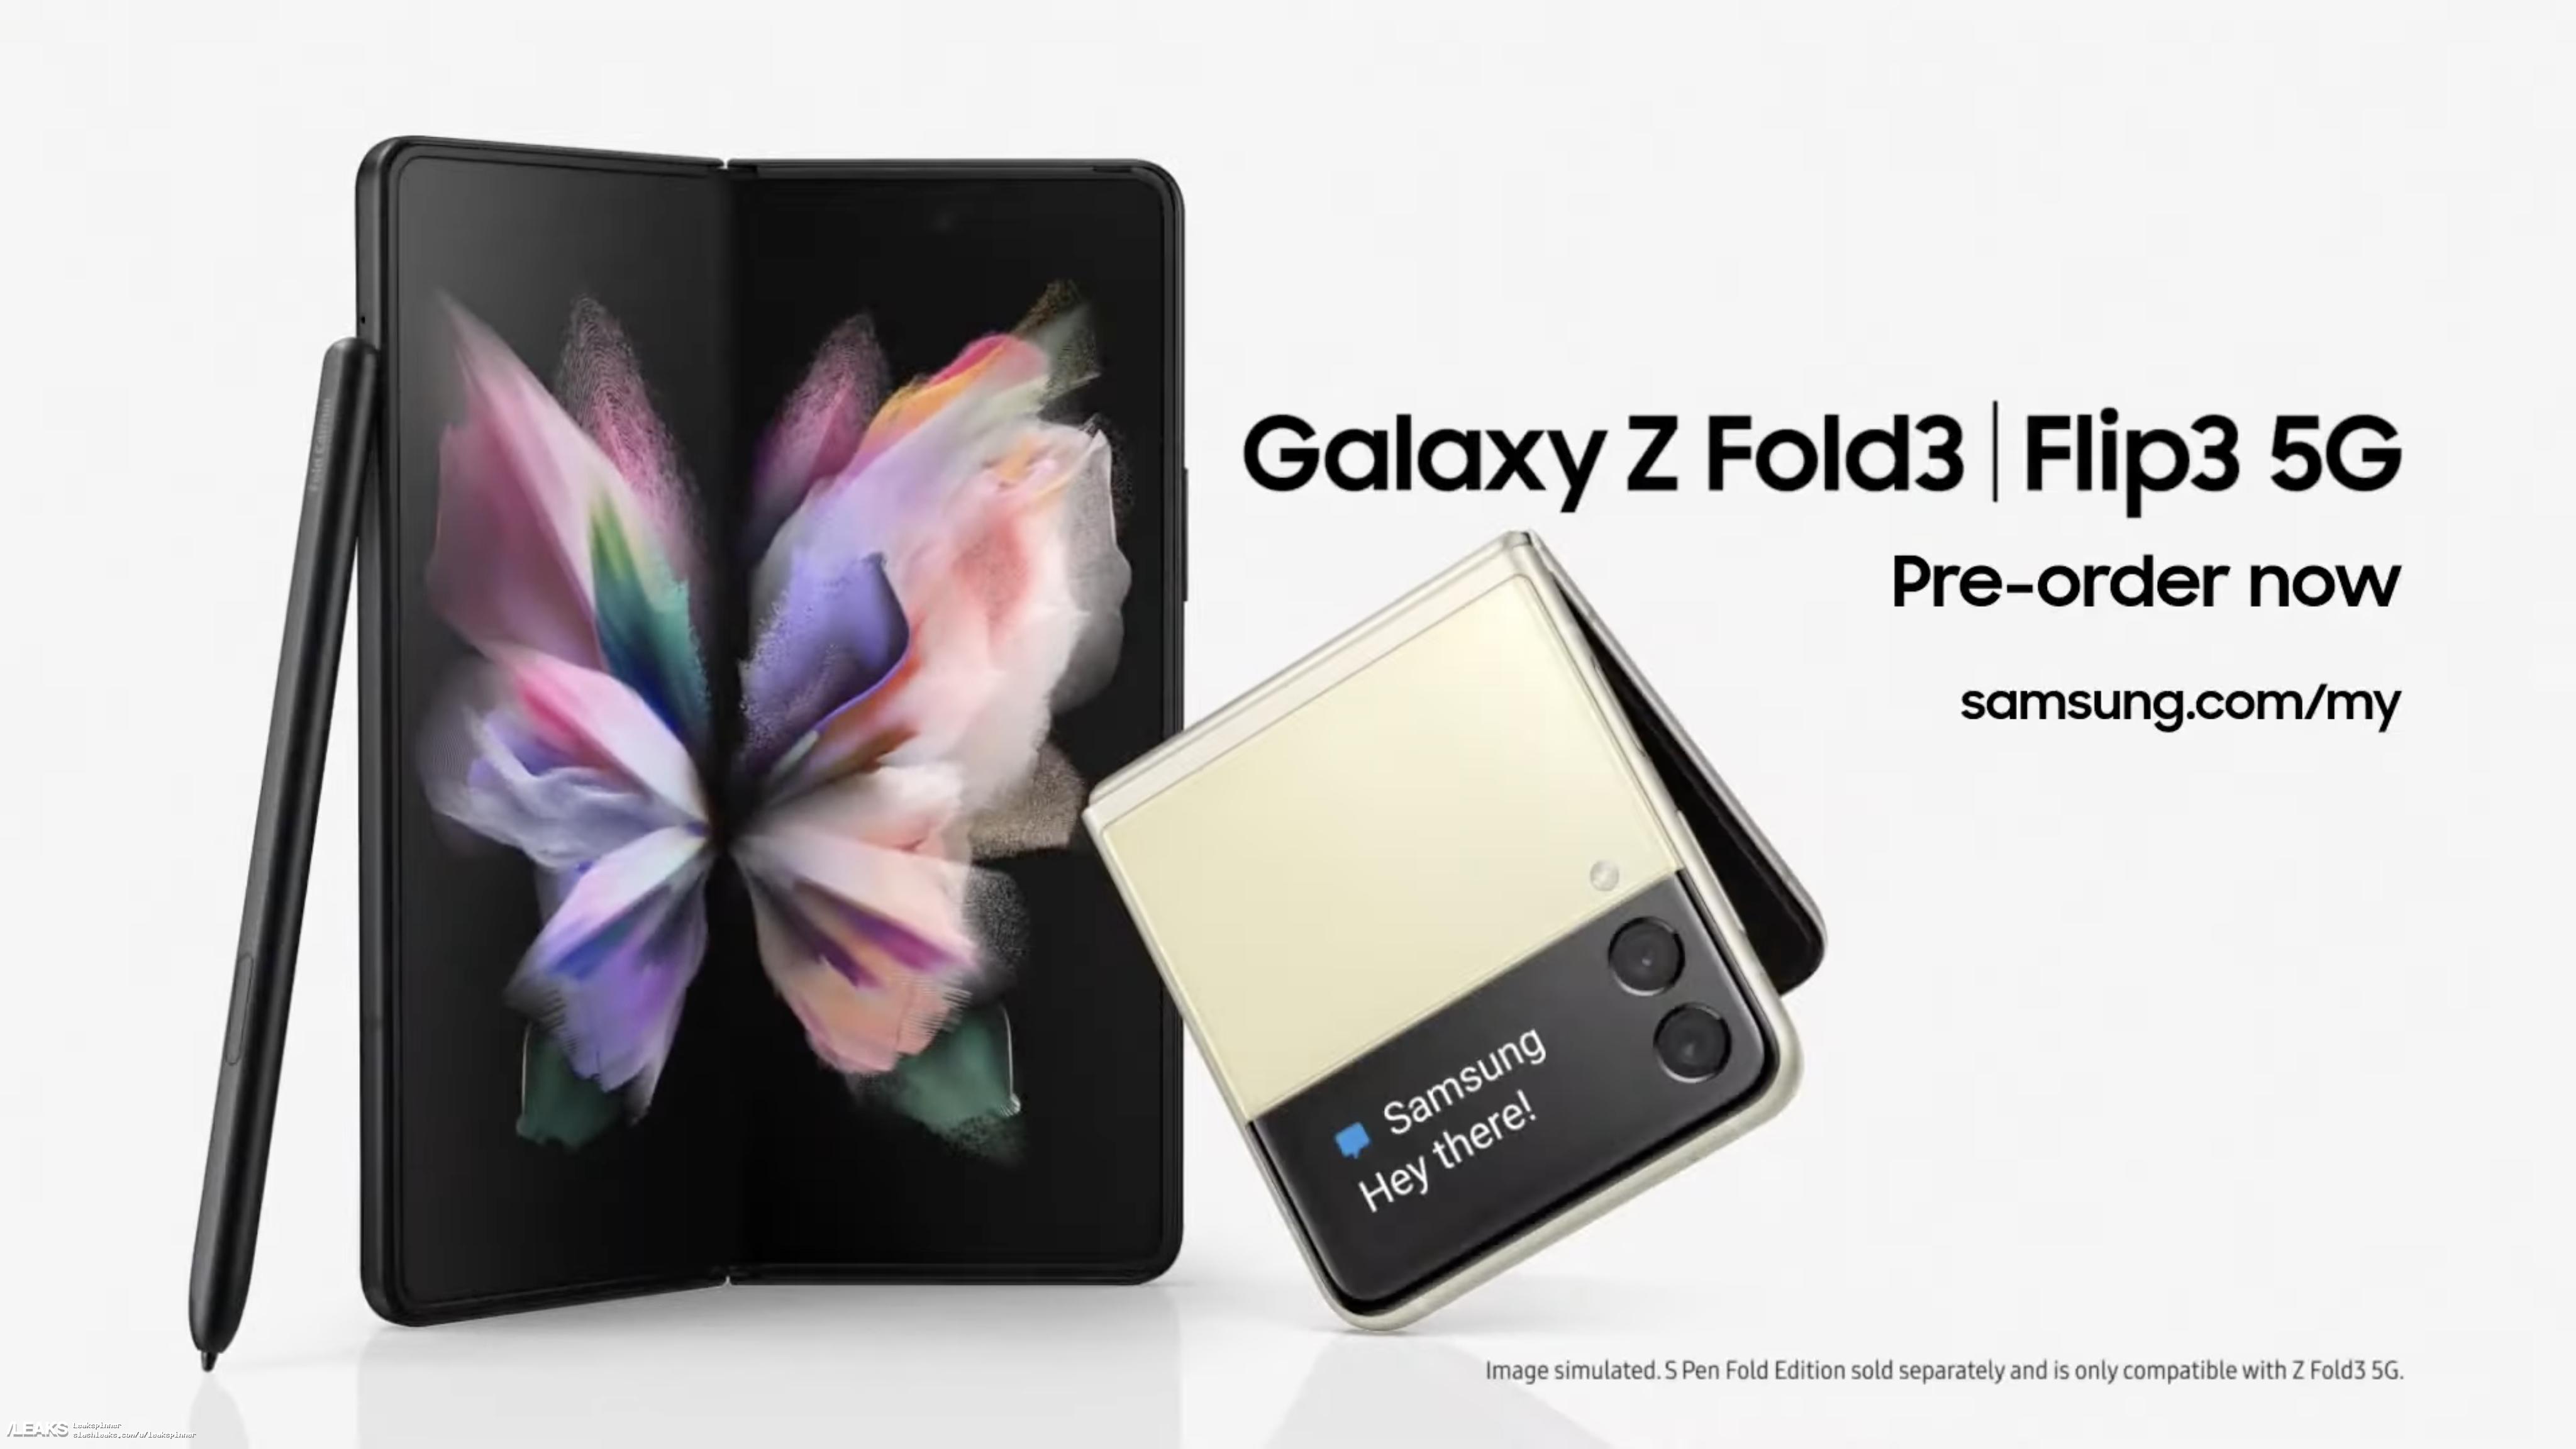 В Сеть утекло промо-видео Samsung Galaxy Z Fold 3 и Galaxy Z Flip 3